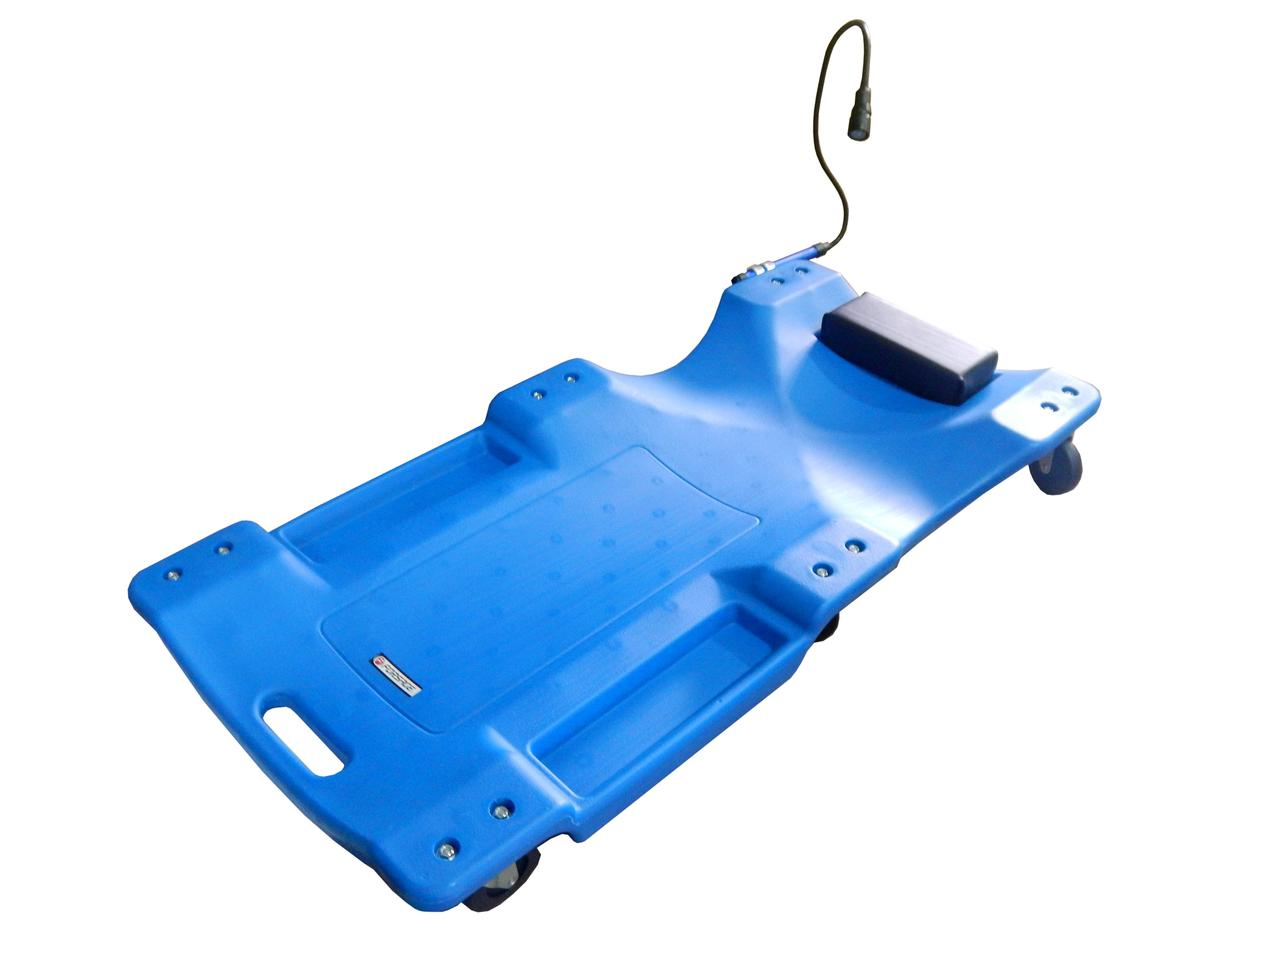 Лежак для автослесаря пластиковый на 6-ти колесах с фонарем на гибком удлинителе 40''(1050х490х95мм)